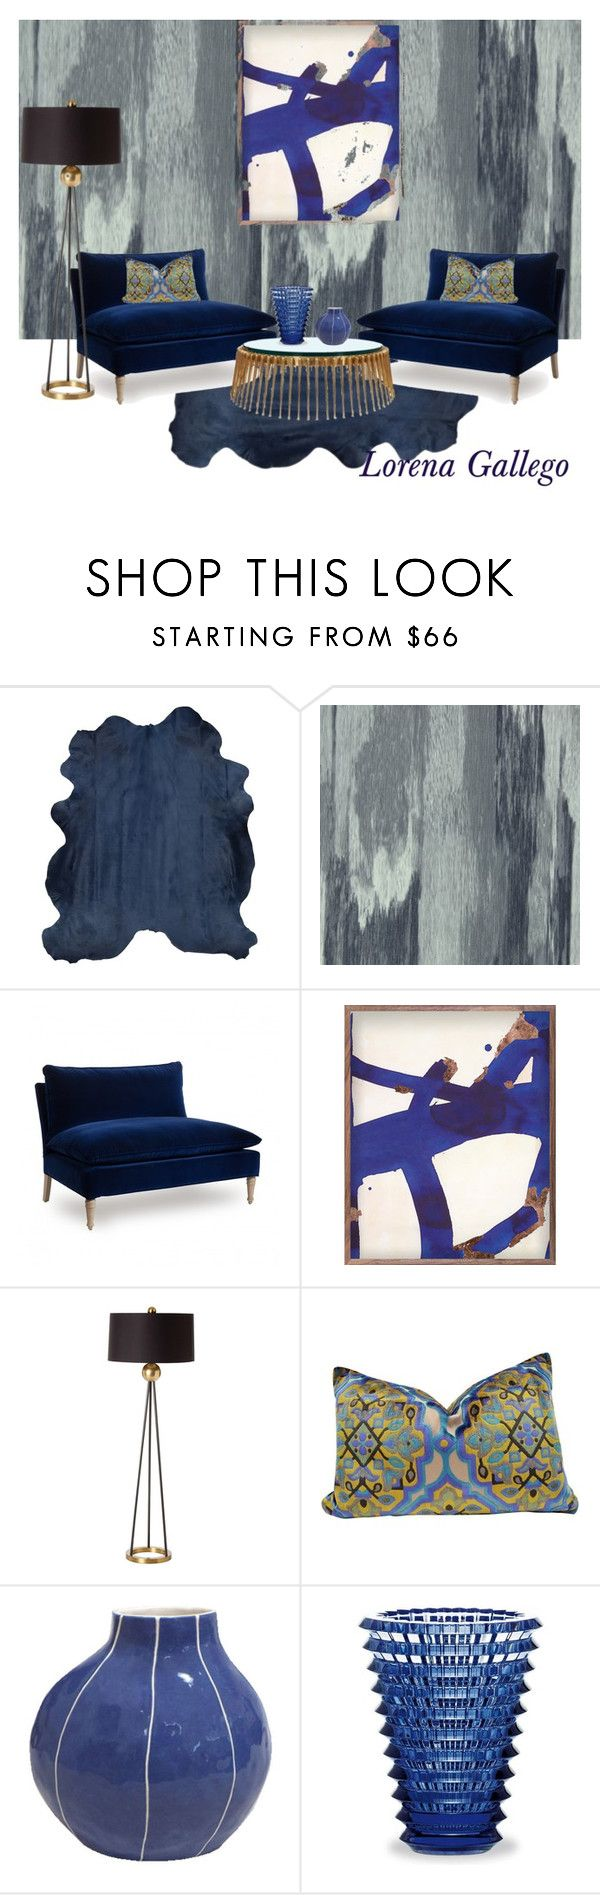 """Depp Blue"" by lorena-gallego on Polyvore featuring interior, interiors, interior design, hogar, home decor, interior decorating, Designers Guild, Horgans, DwellStudio y Arteriors"